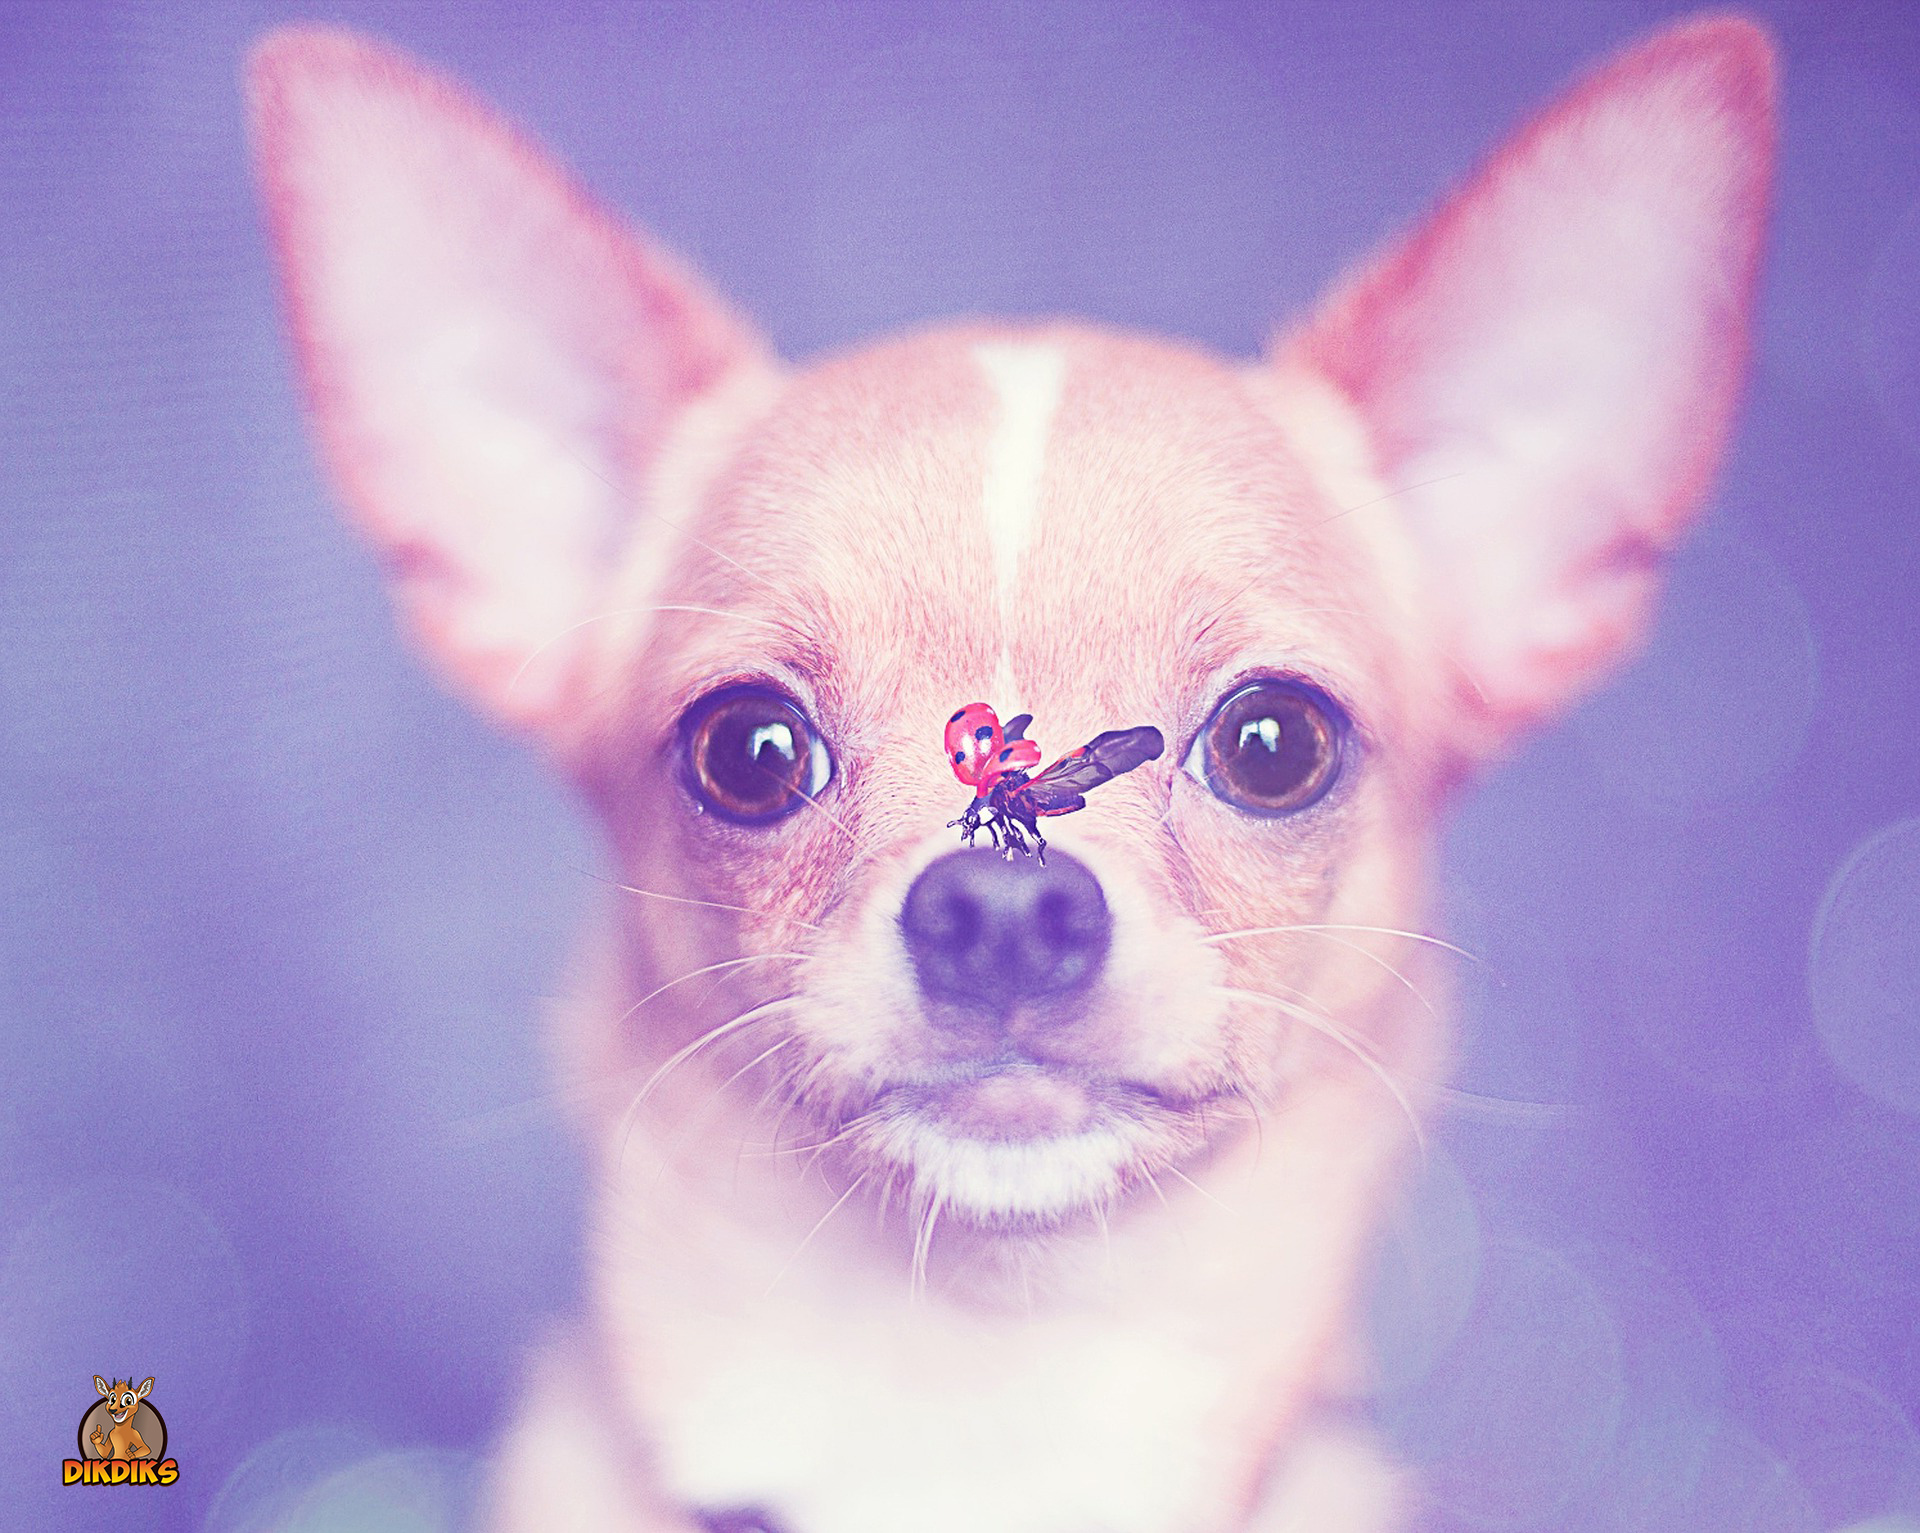 Chihuahua-Welpe-mit-Marienkäfer